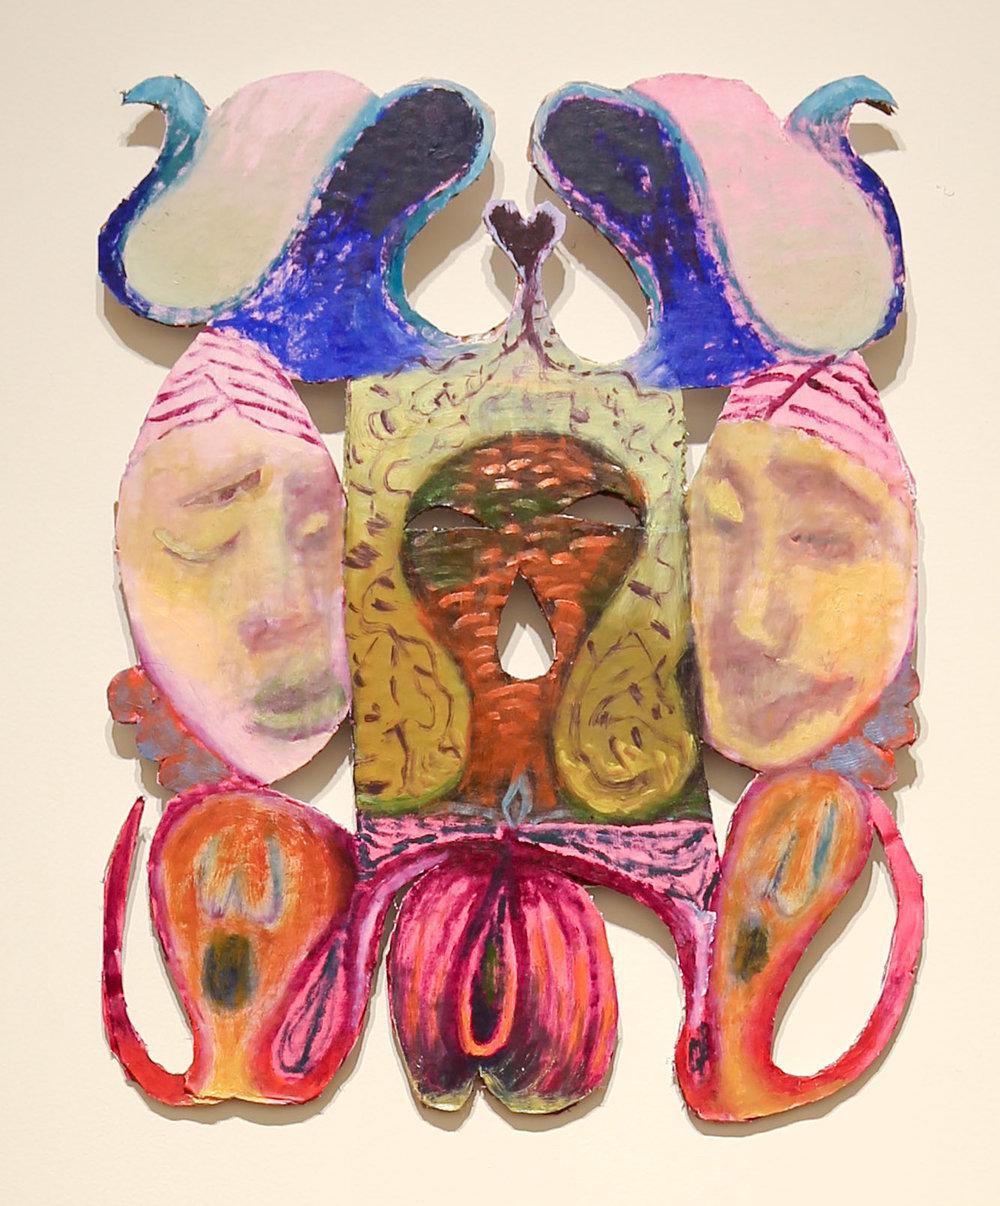 Untitled (Face Mask)